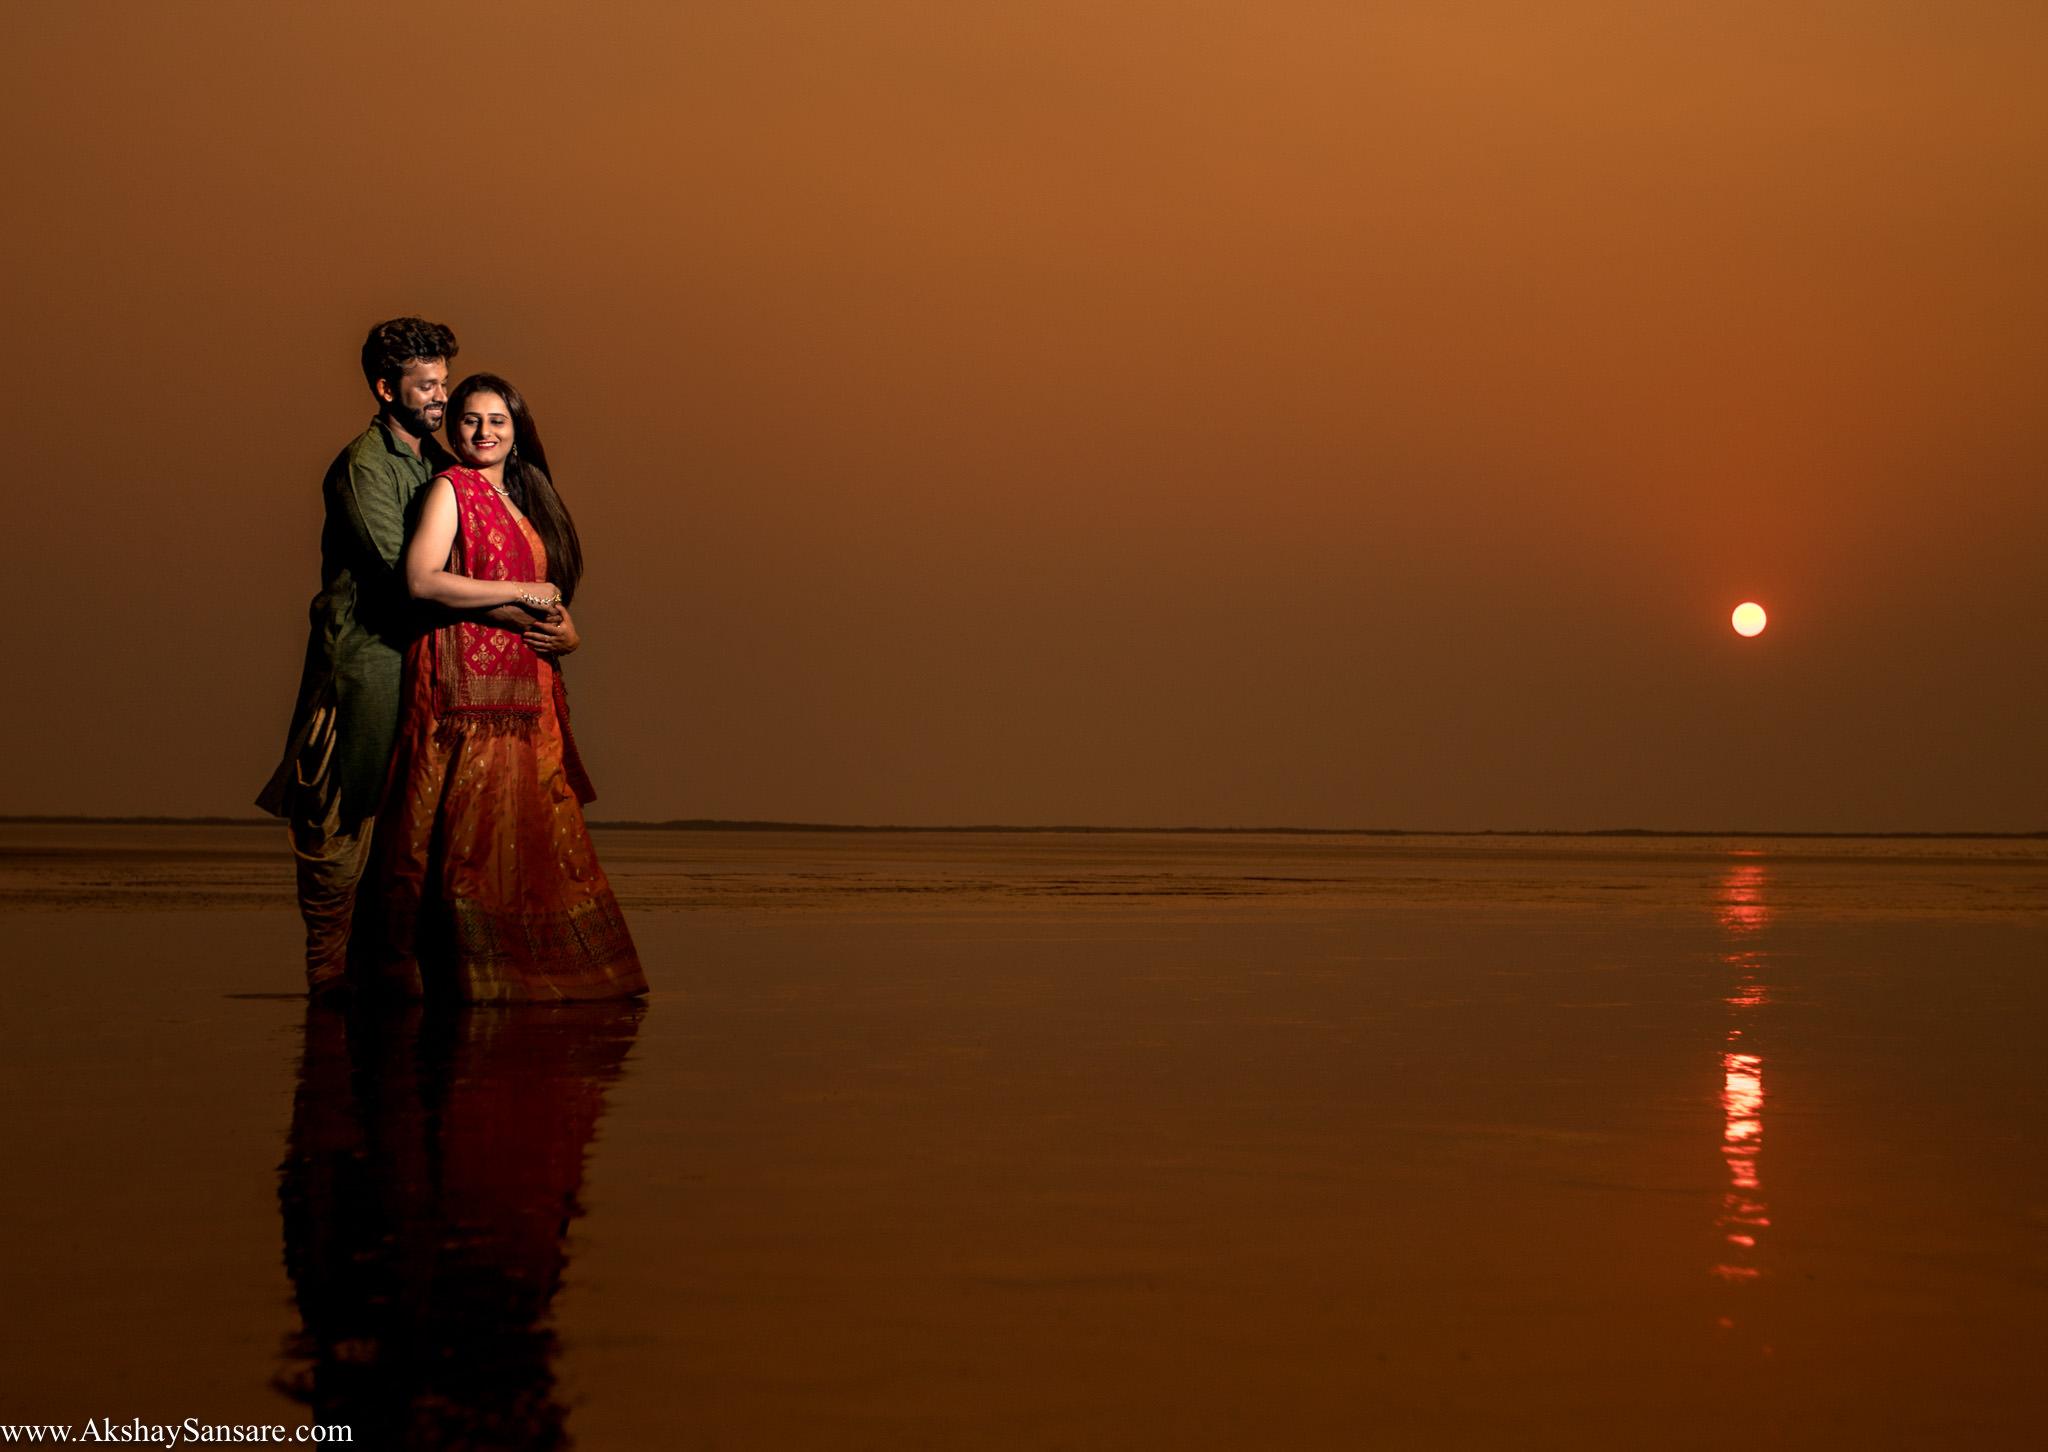 Priyanka x Sushank Pre-wedding Best Candid Photographer in Mumbai Akshay Sansare India(28).jpg